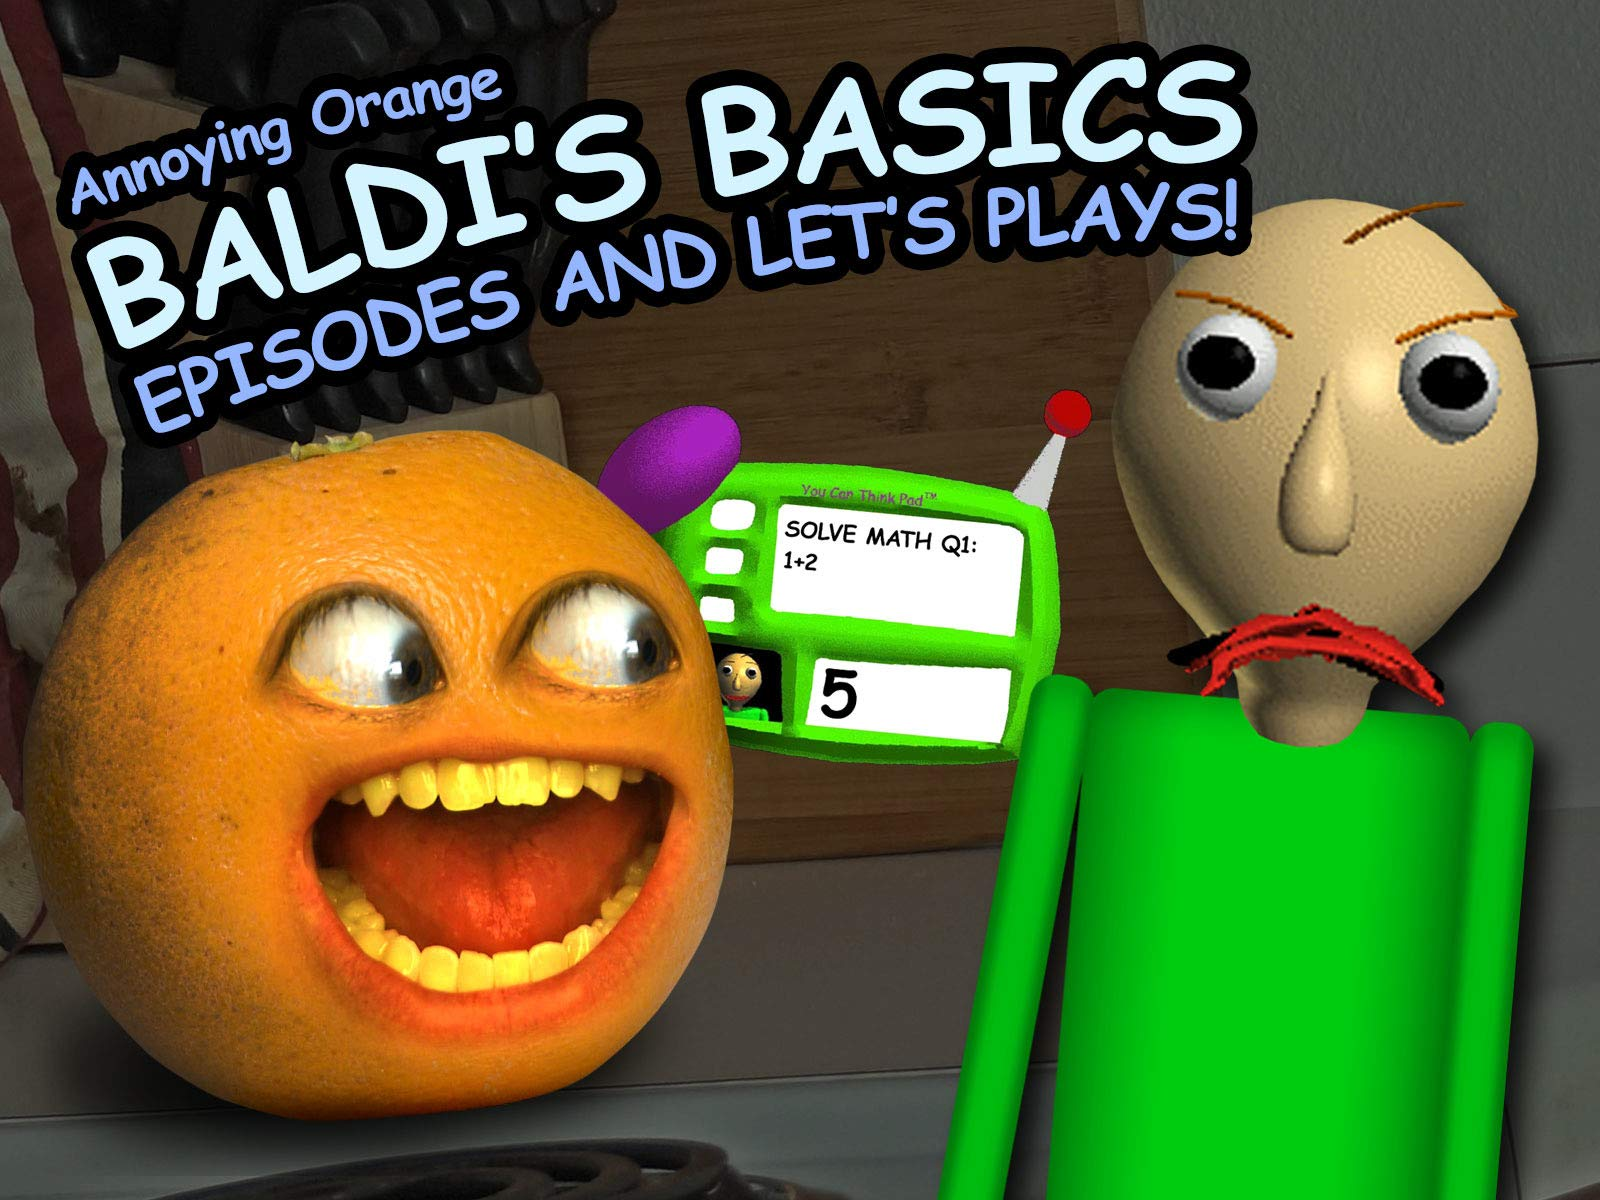 Clip: Annoying Orange - Baldi's Basics Episodes and Let's Plays! - Season 1